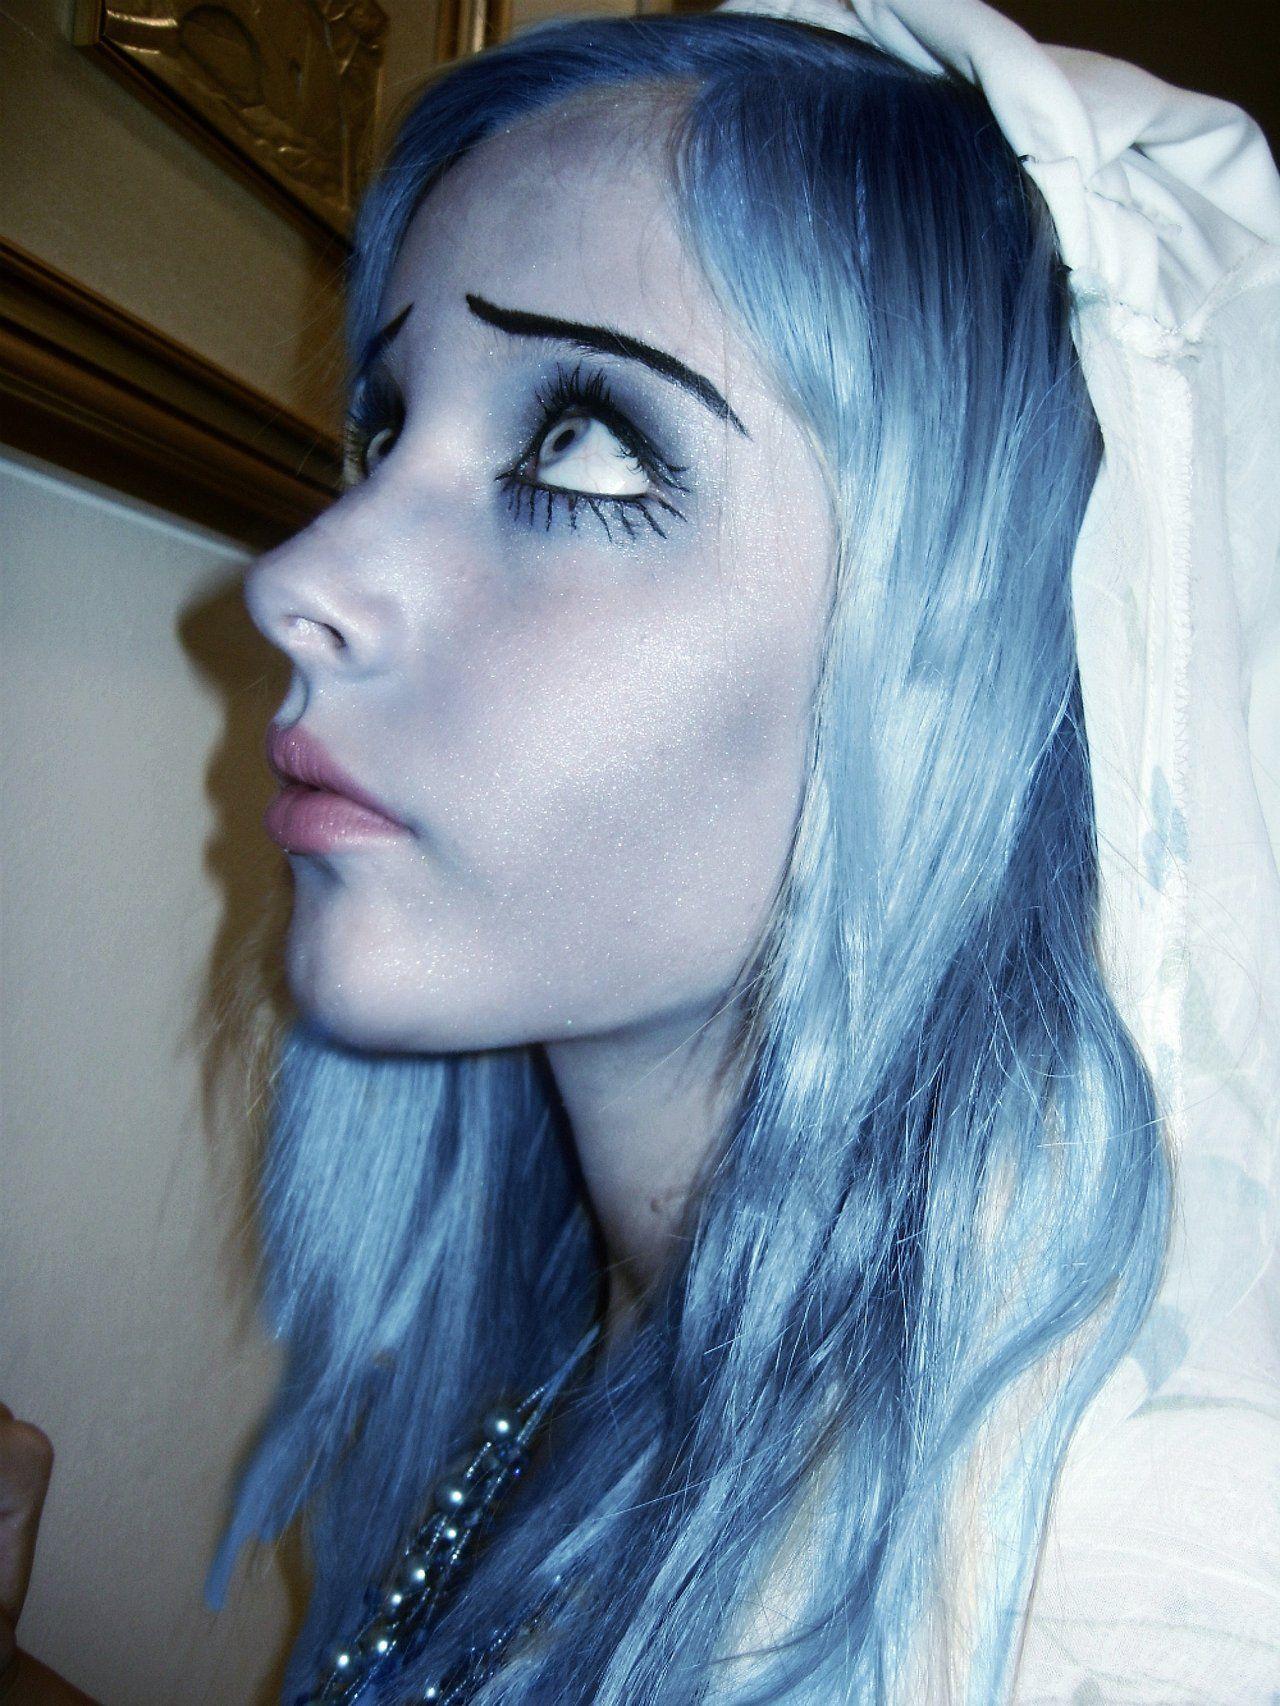 corpse bride - Google Search   Bailey halloween   Pinterest